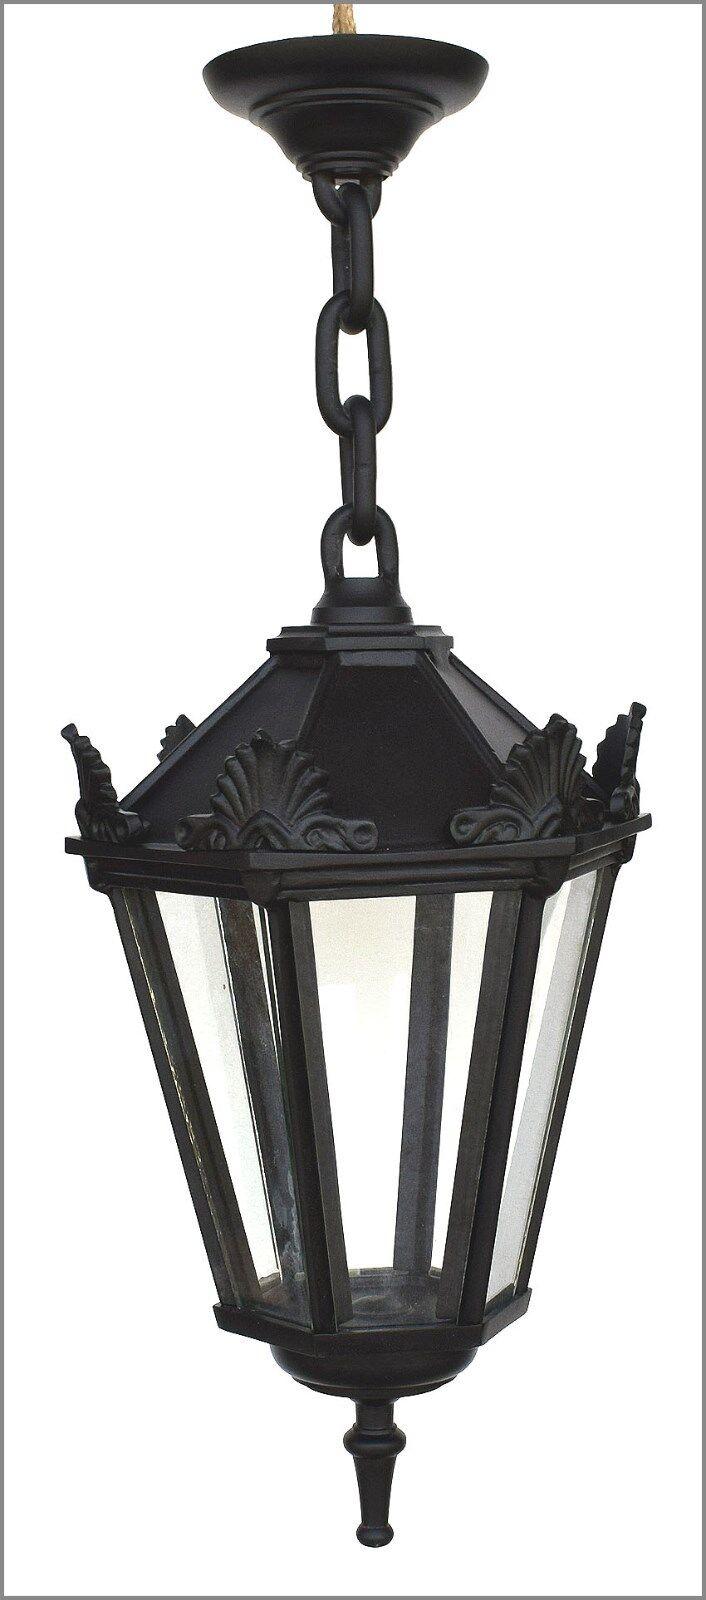 Antik Style Alte Form Aluminium Garten Hängelampe Lampe Laterne Schwarz